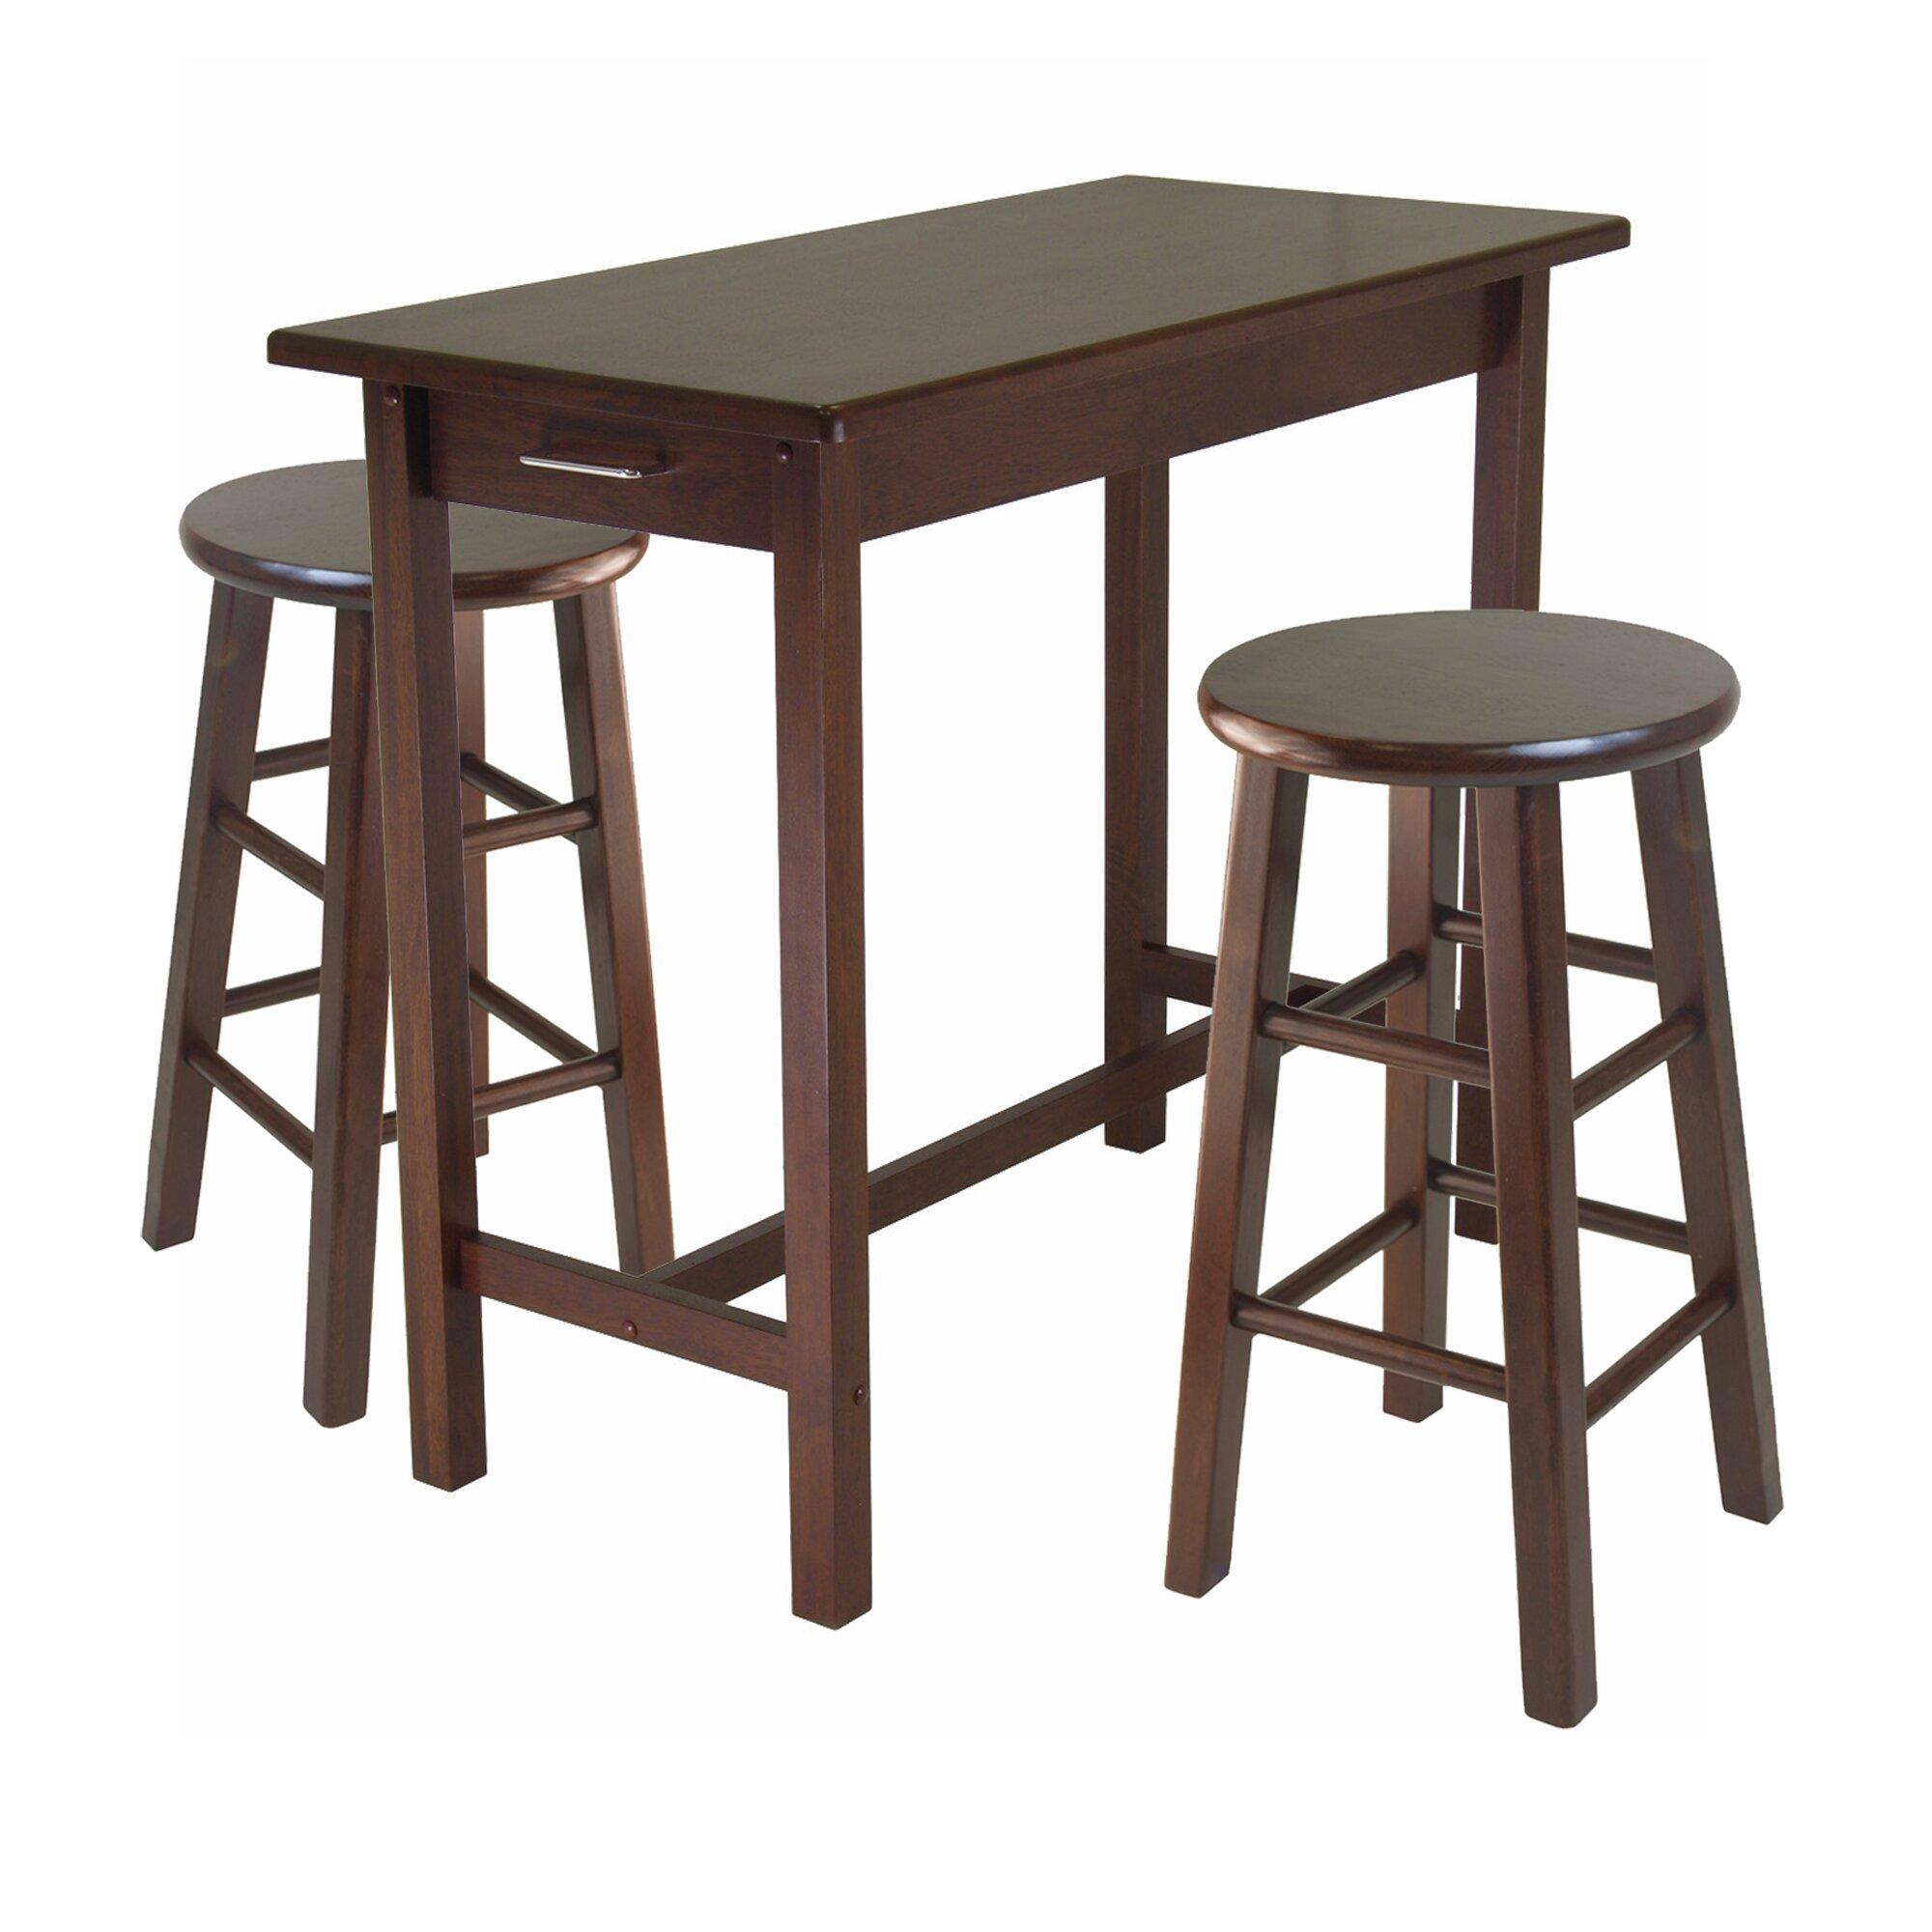 3 piece breakfast dining set wayfair. Black Bedroom Furniture Sets. Home Design Ideas